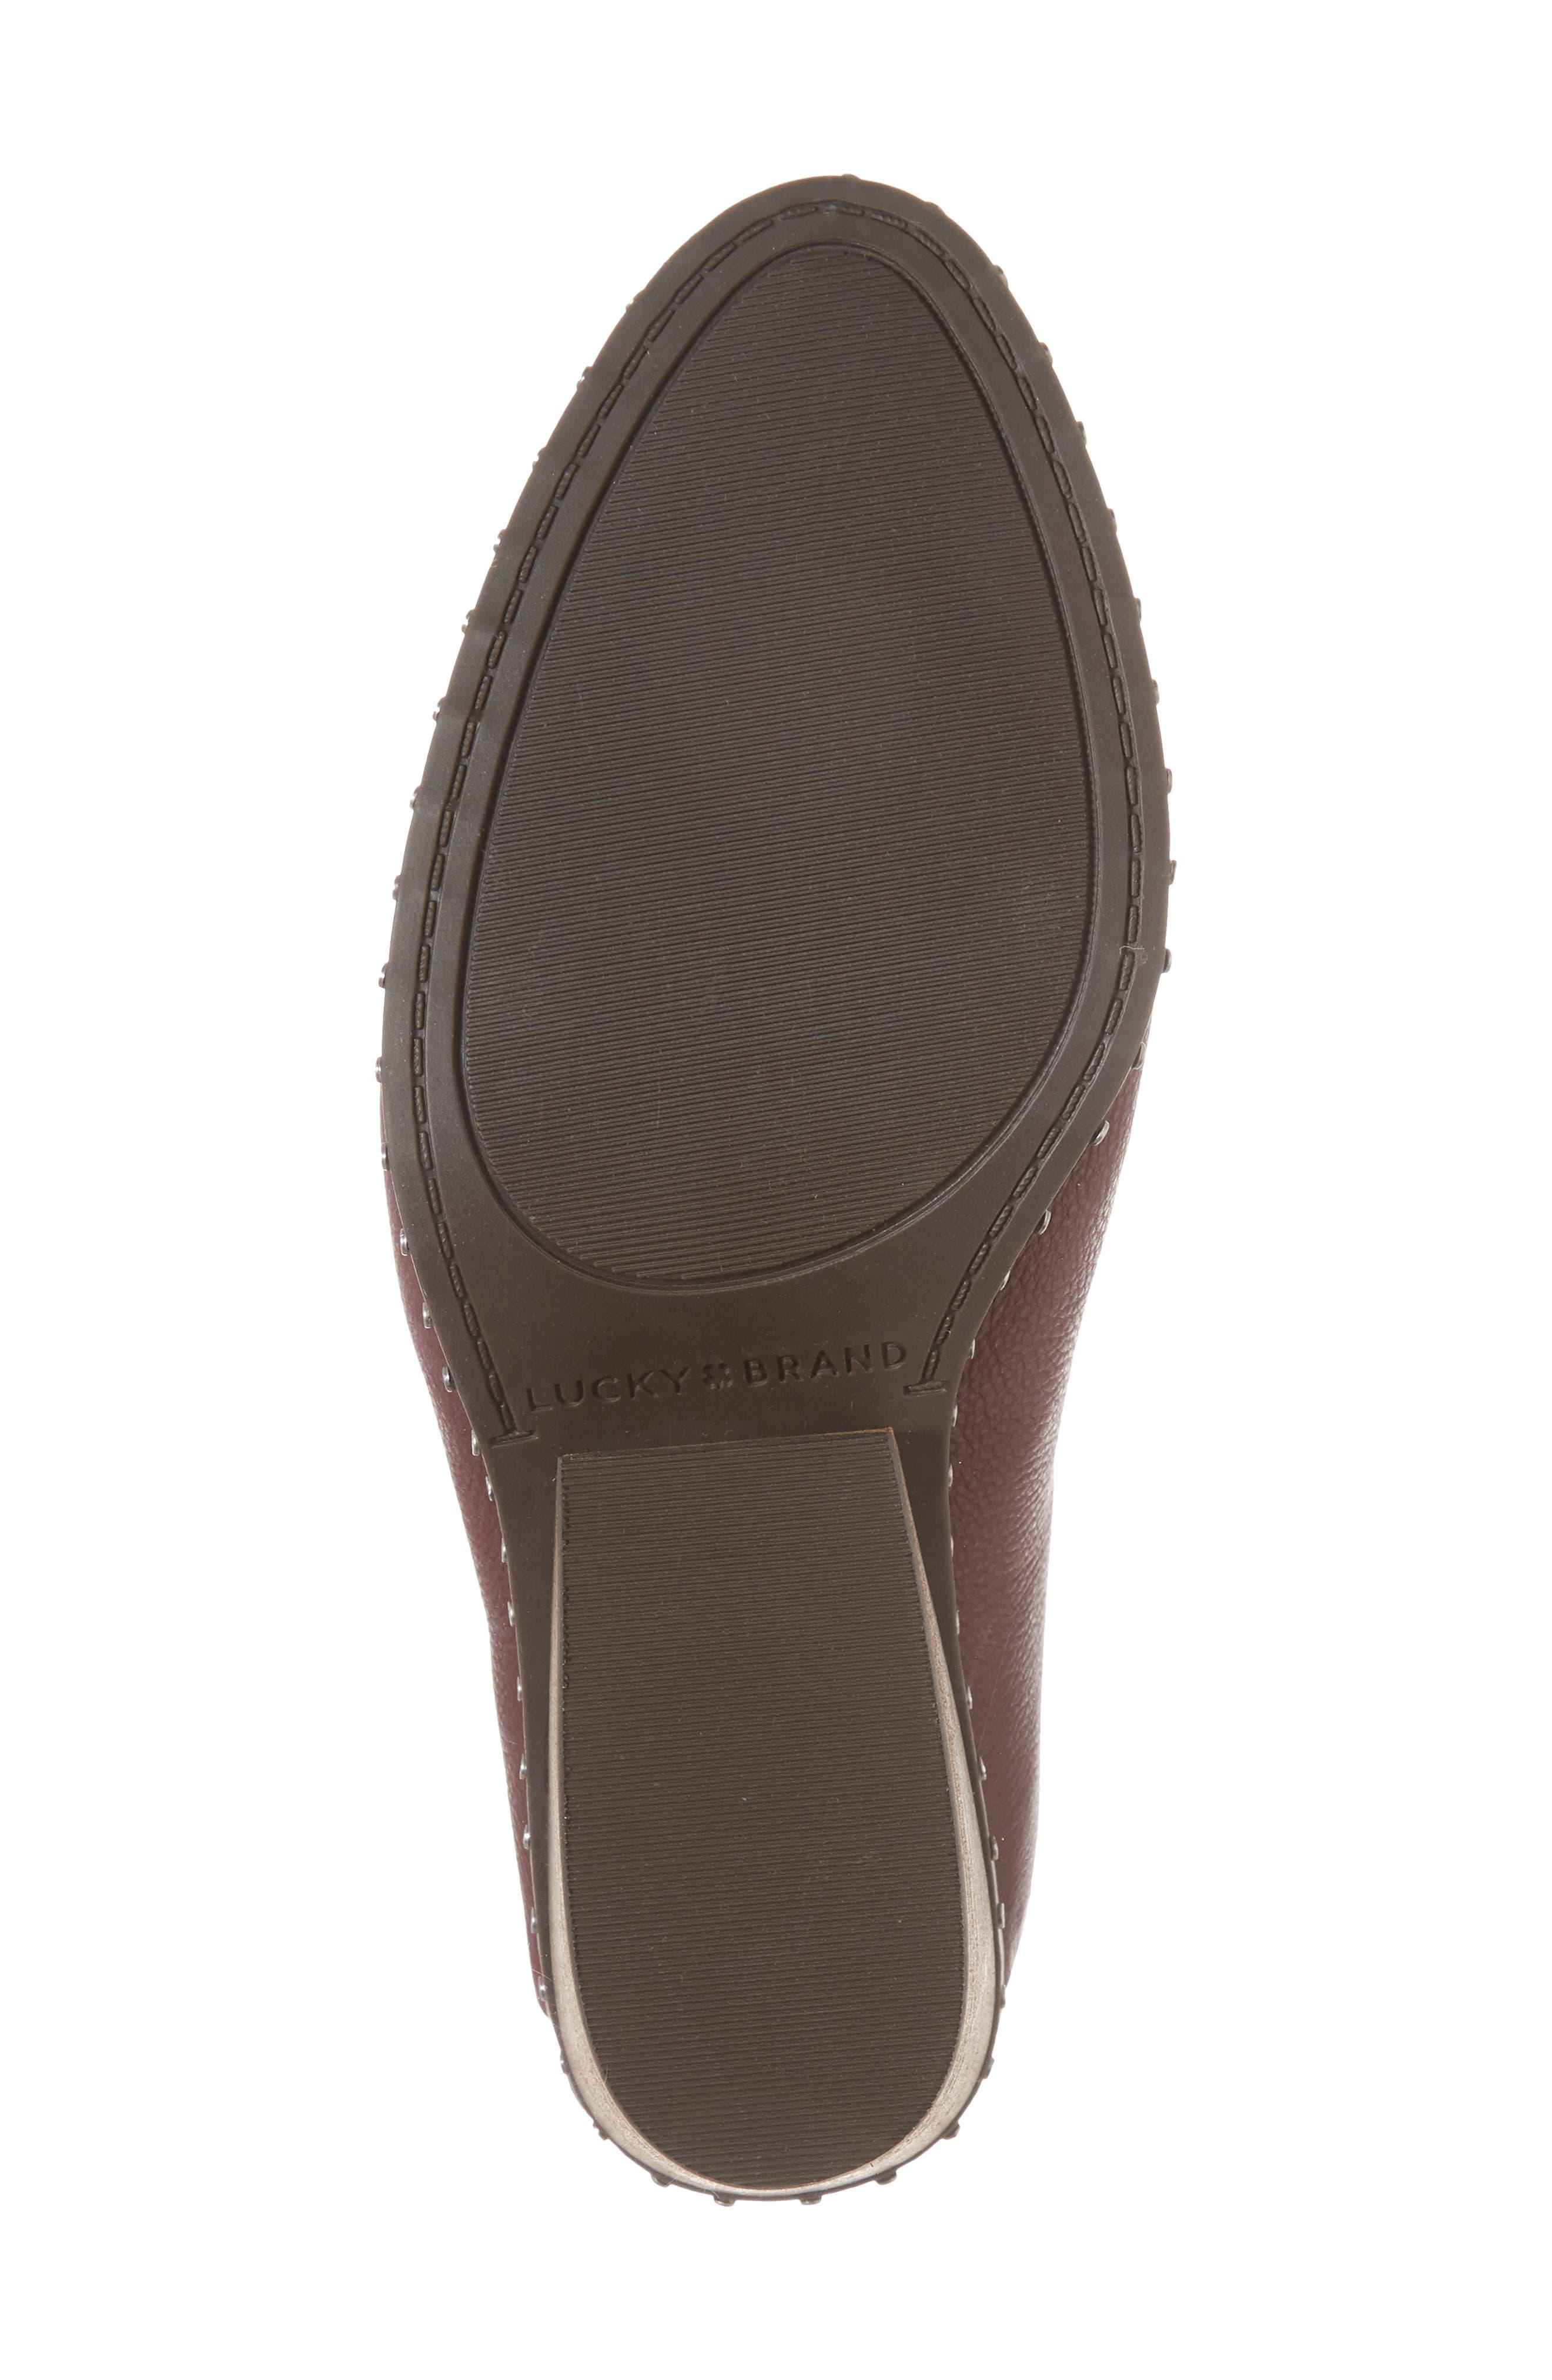 Larsson2 Studded Mule,                             Alternate thumbnail 6, color,                             Tawny Port Leather